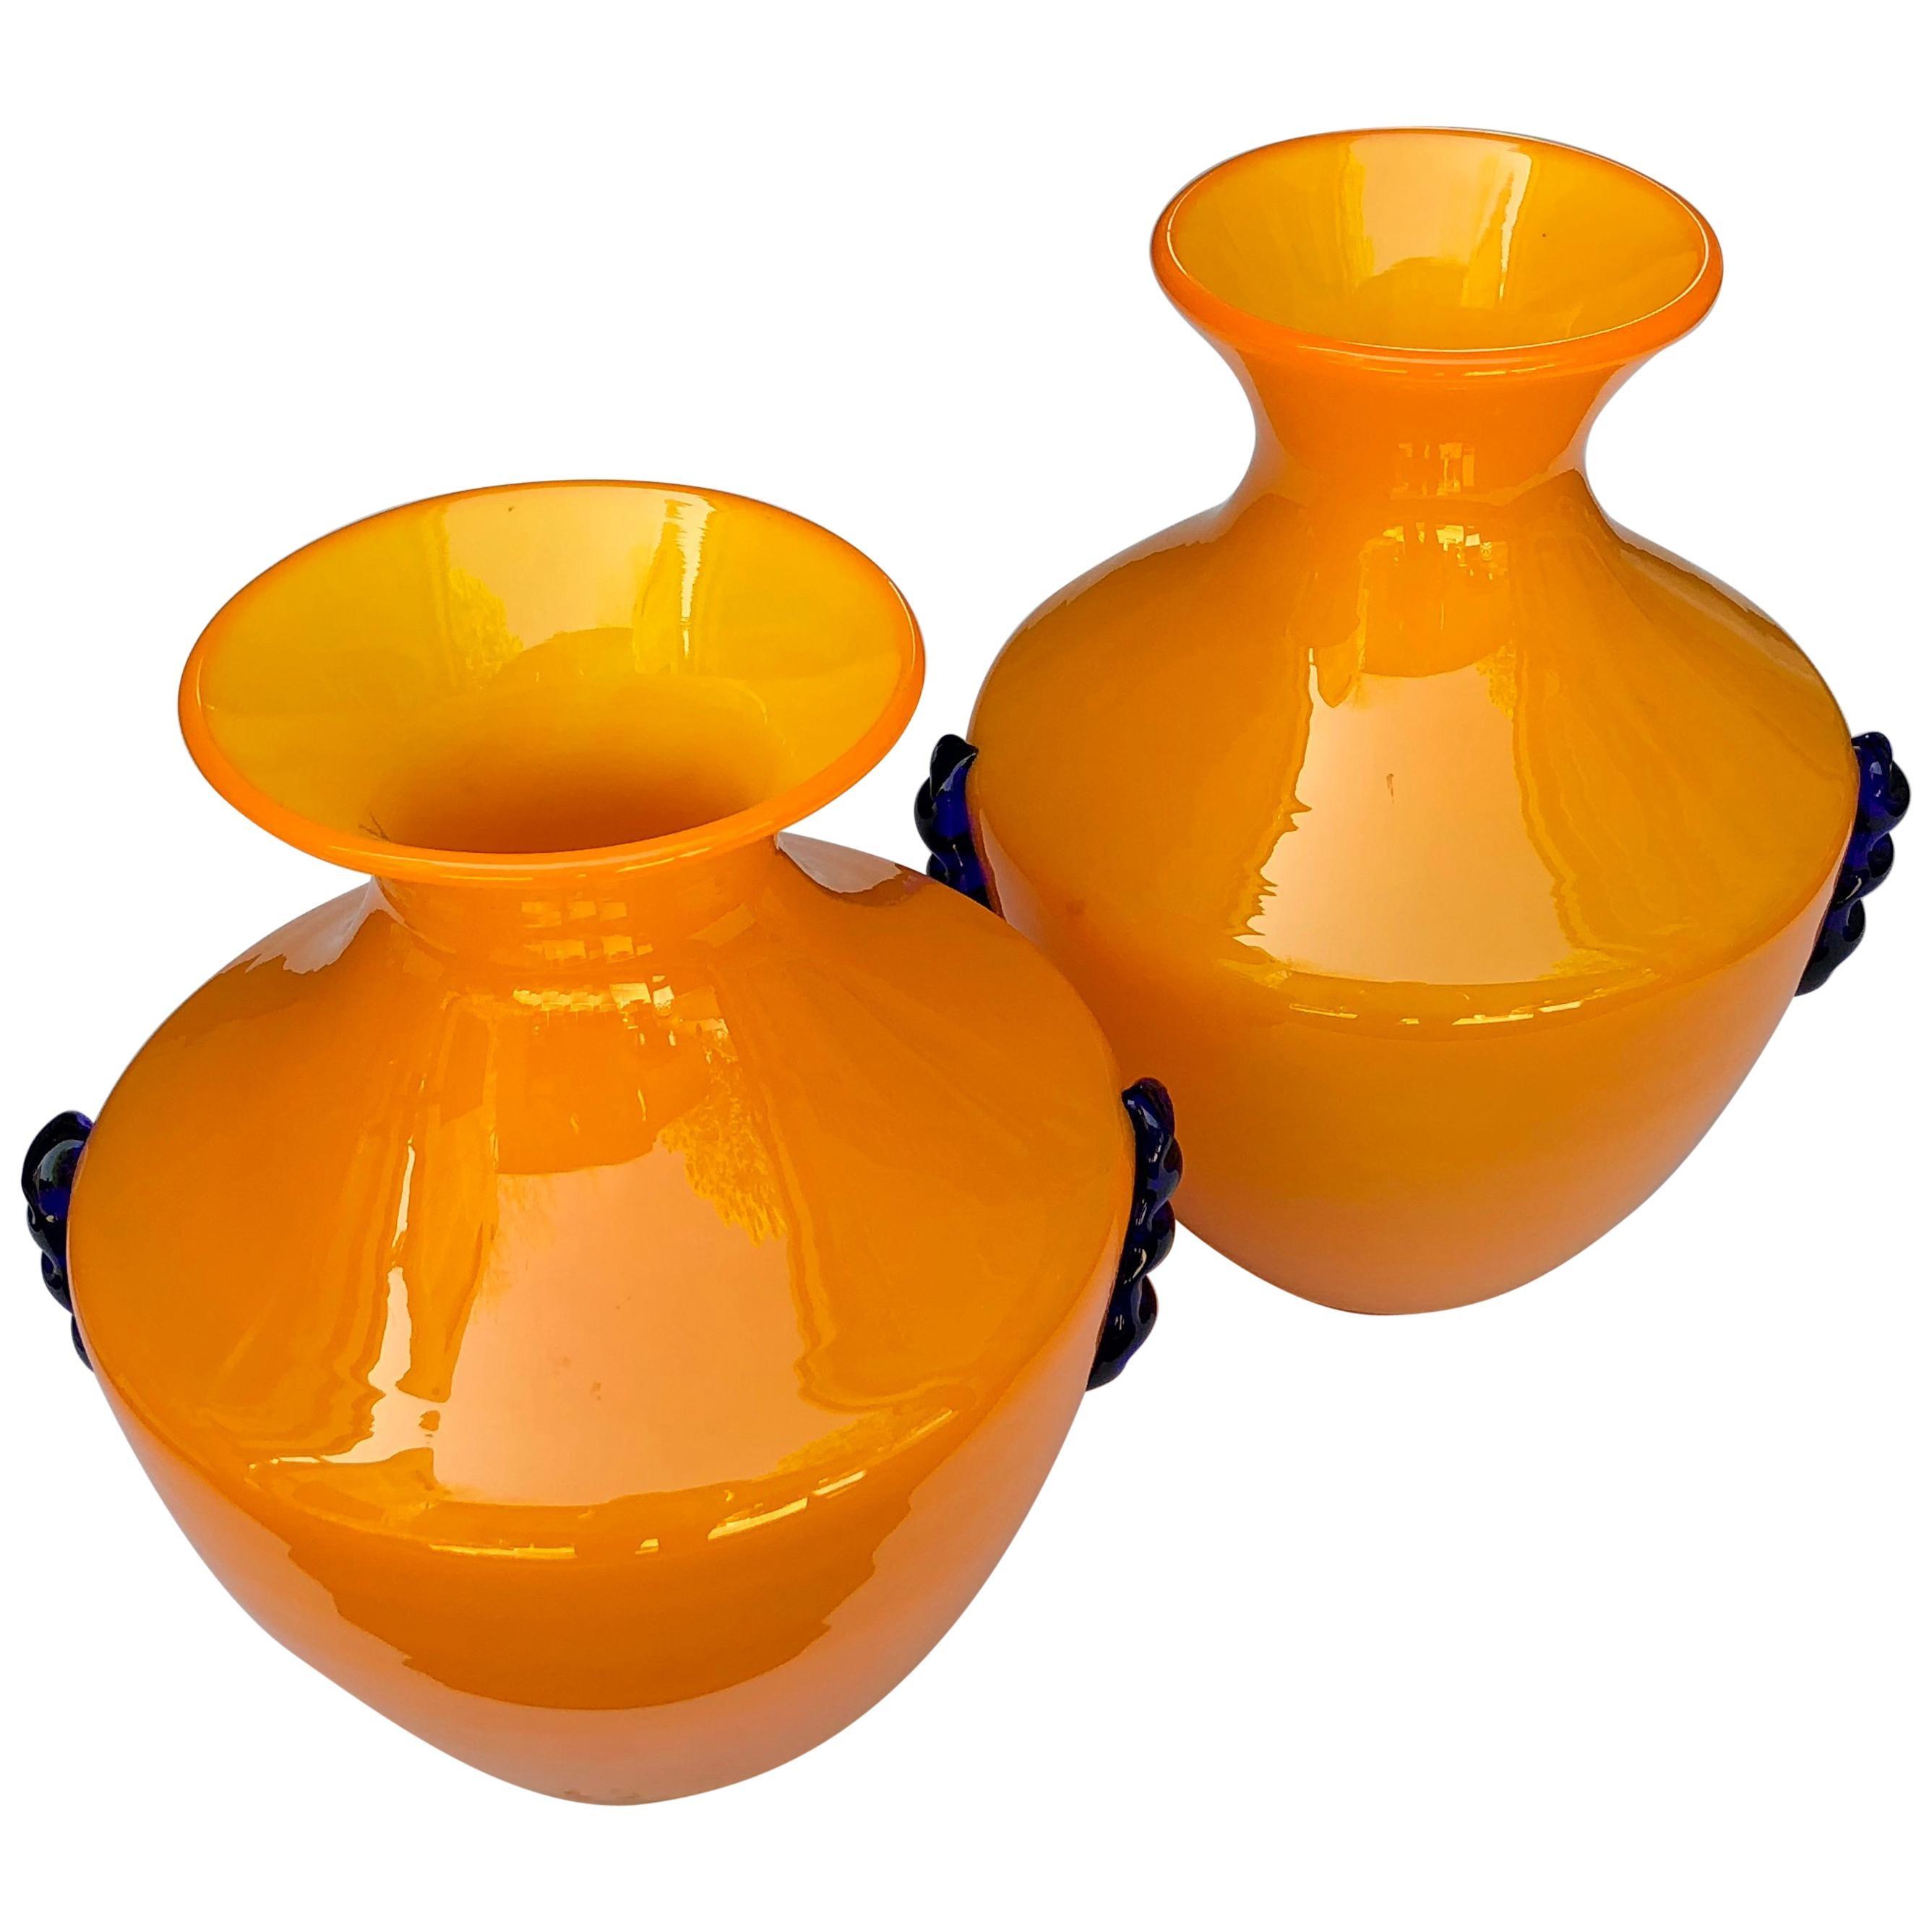 Rare Pair of Blenko Orange Glass Vases with Applied Cobalt Decoration